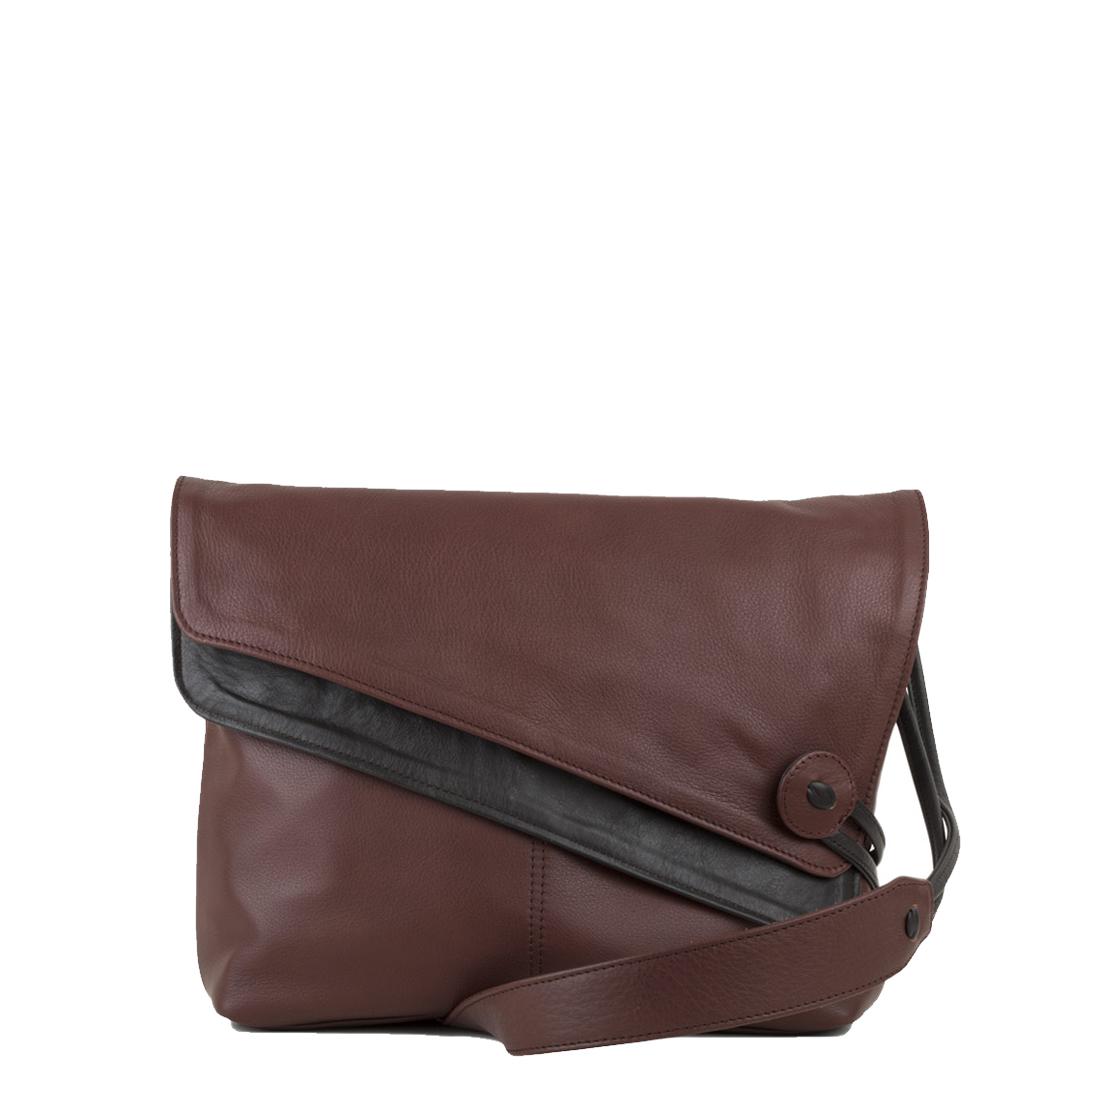 Lindsay Brown Across Body Leather Bag